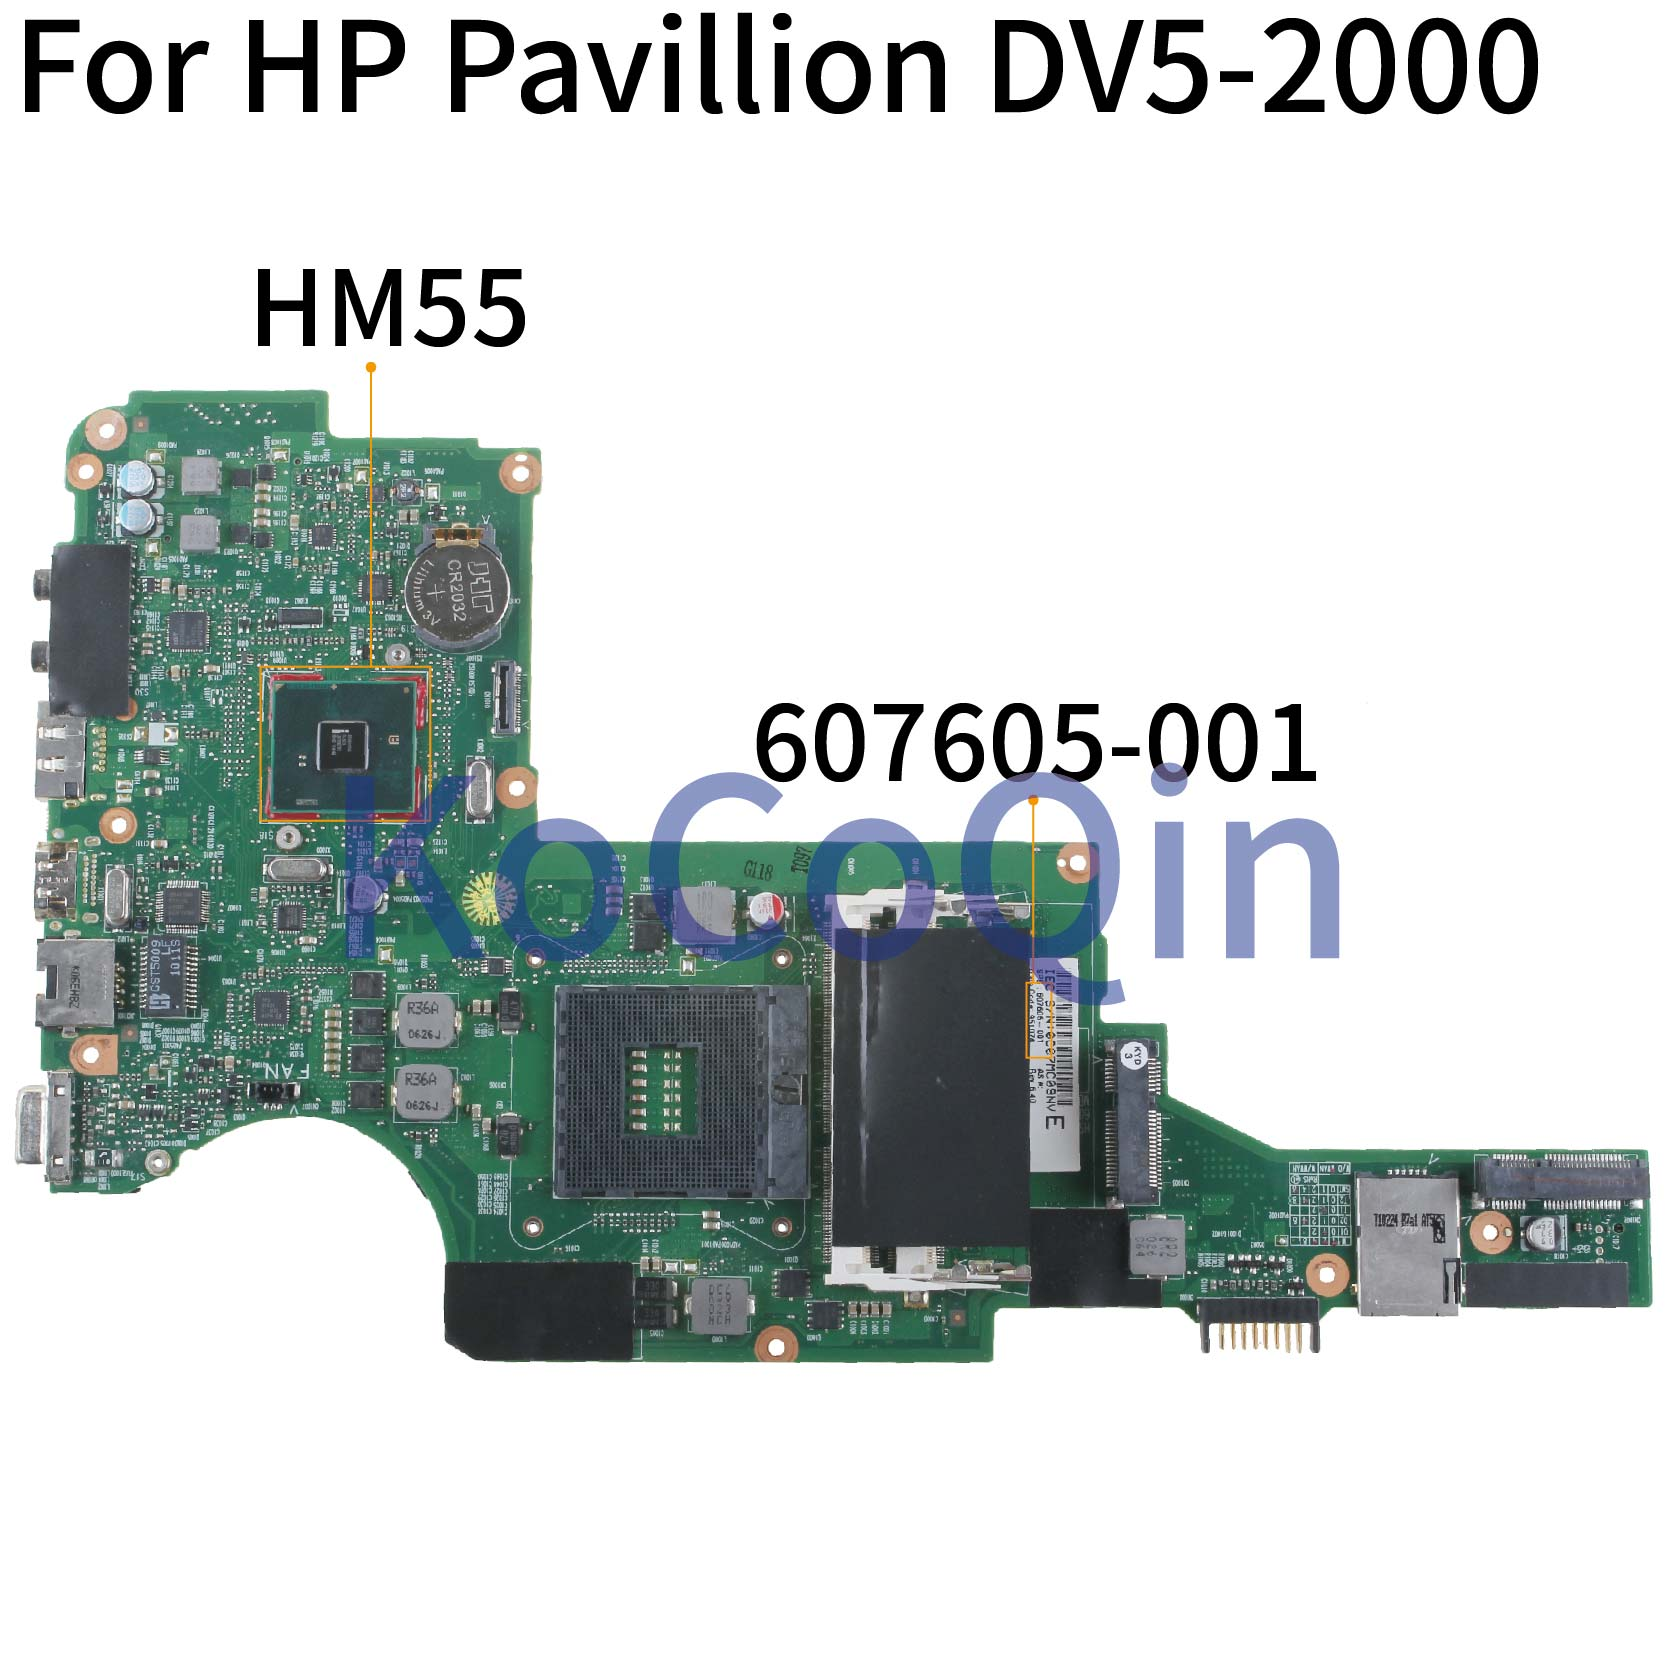 KoCoQin محمول لوحة رئيسية لأجهزة HP بافيليون DV5 DV5-2000 HM55 اللوحة 607605-501 DDR3